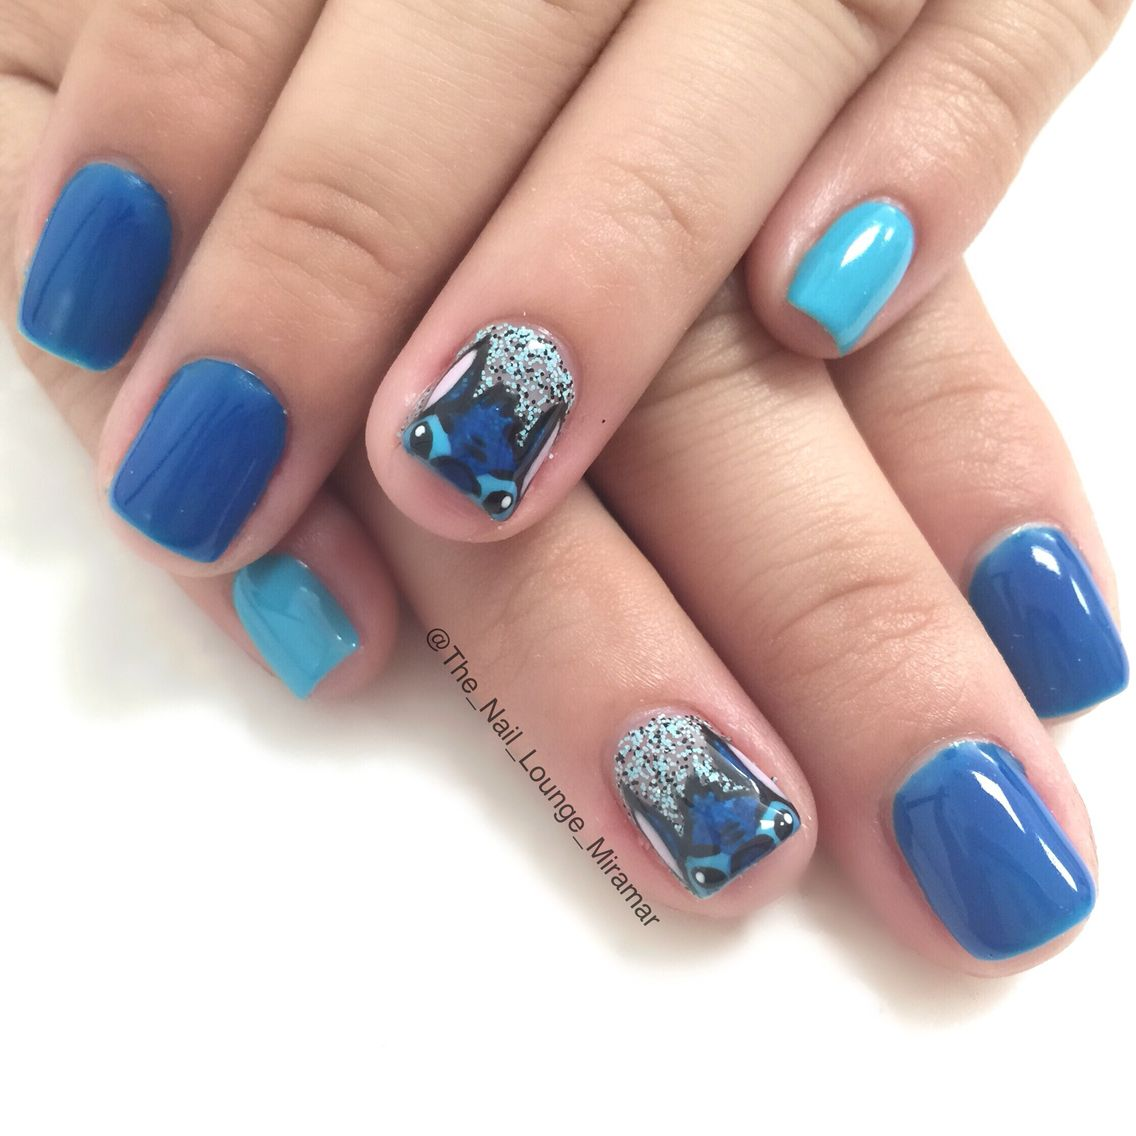 LILO and stitch nail art design - Disney Nails | Pinterest